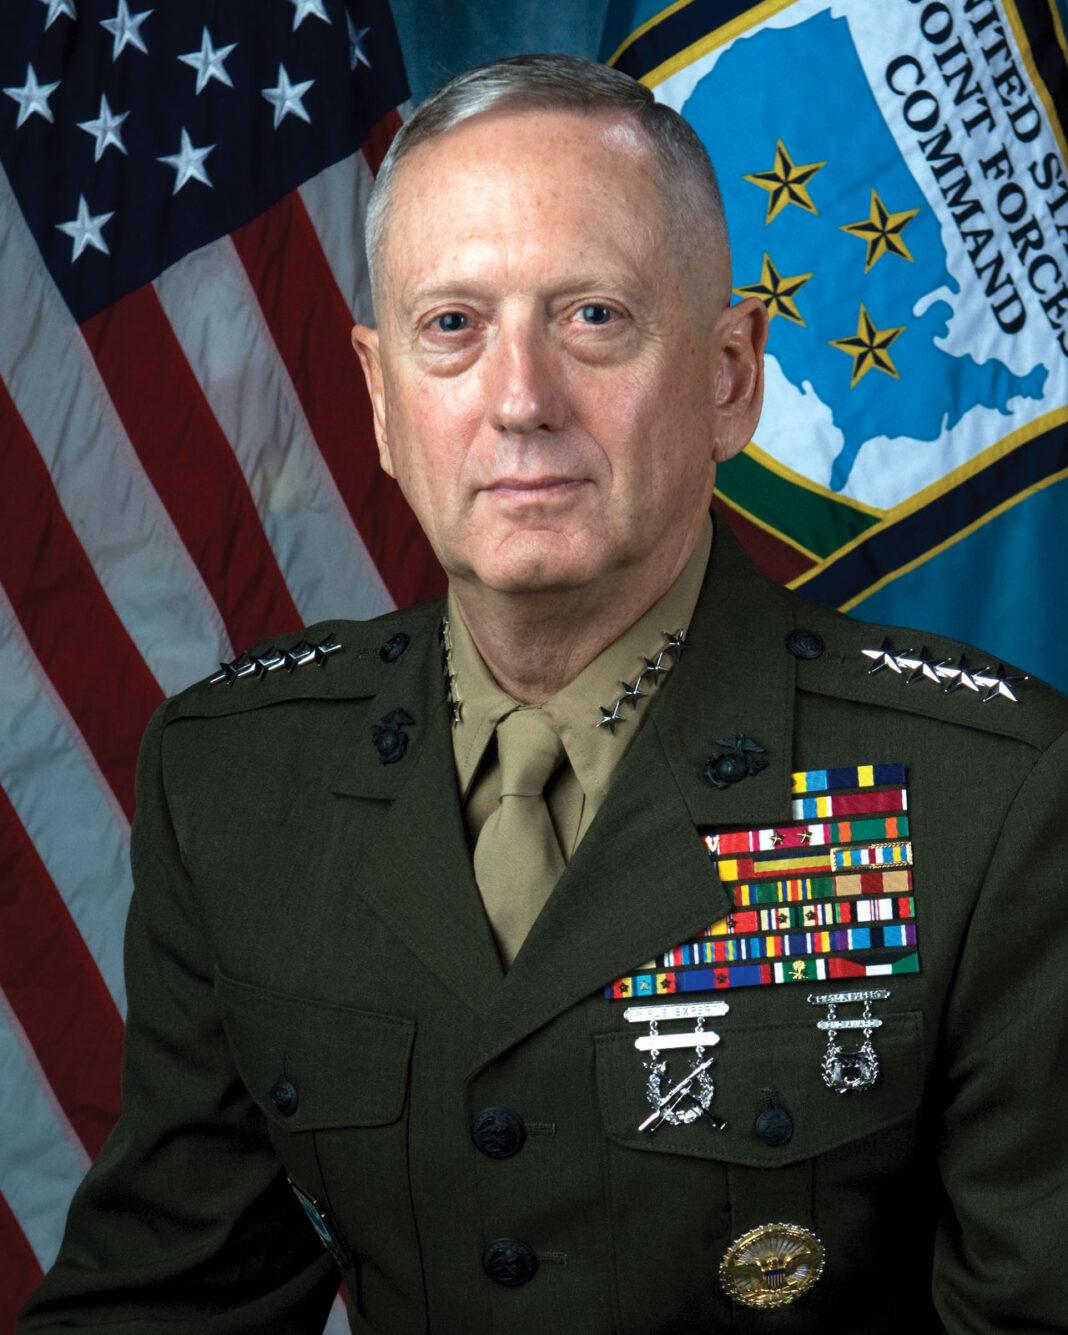 James Mattis